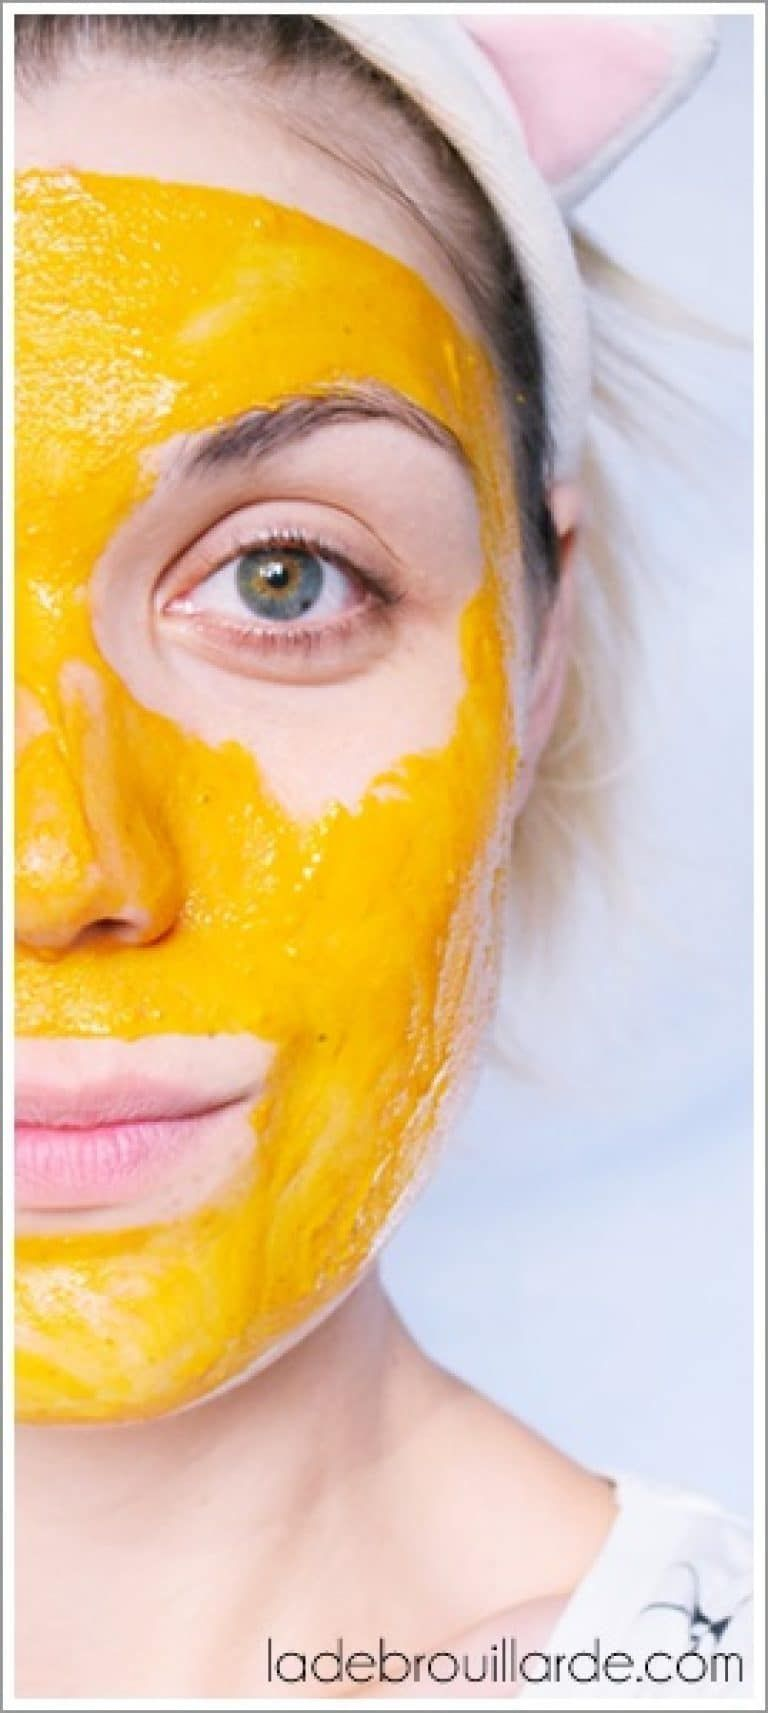 masque anti bouton anti ride hydratant curcuma bt masque anti bouton masque et masque curcuma. Black Bedroom Furniture Sets. Home Design Ideas